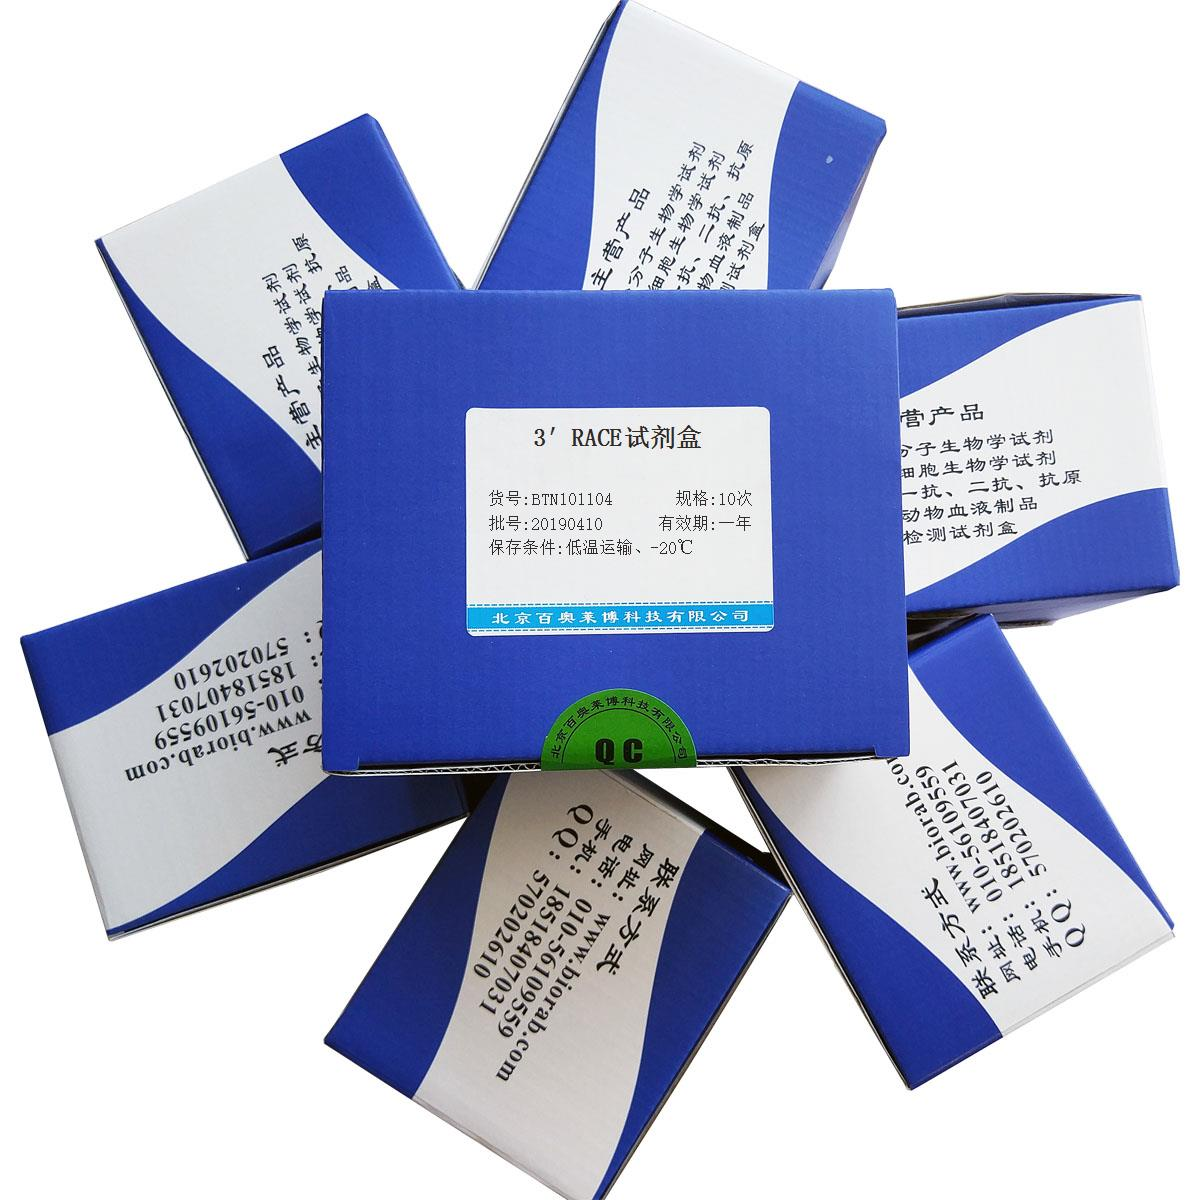 3′RACE试剂盒北京厂家